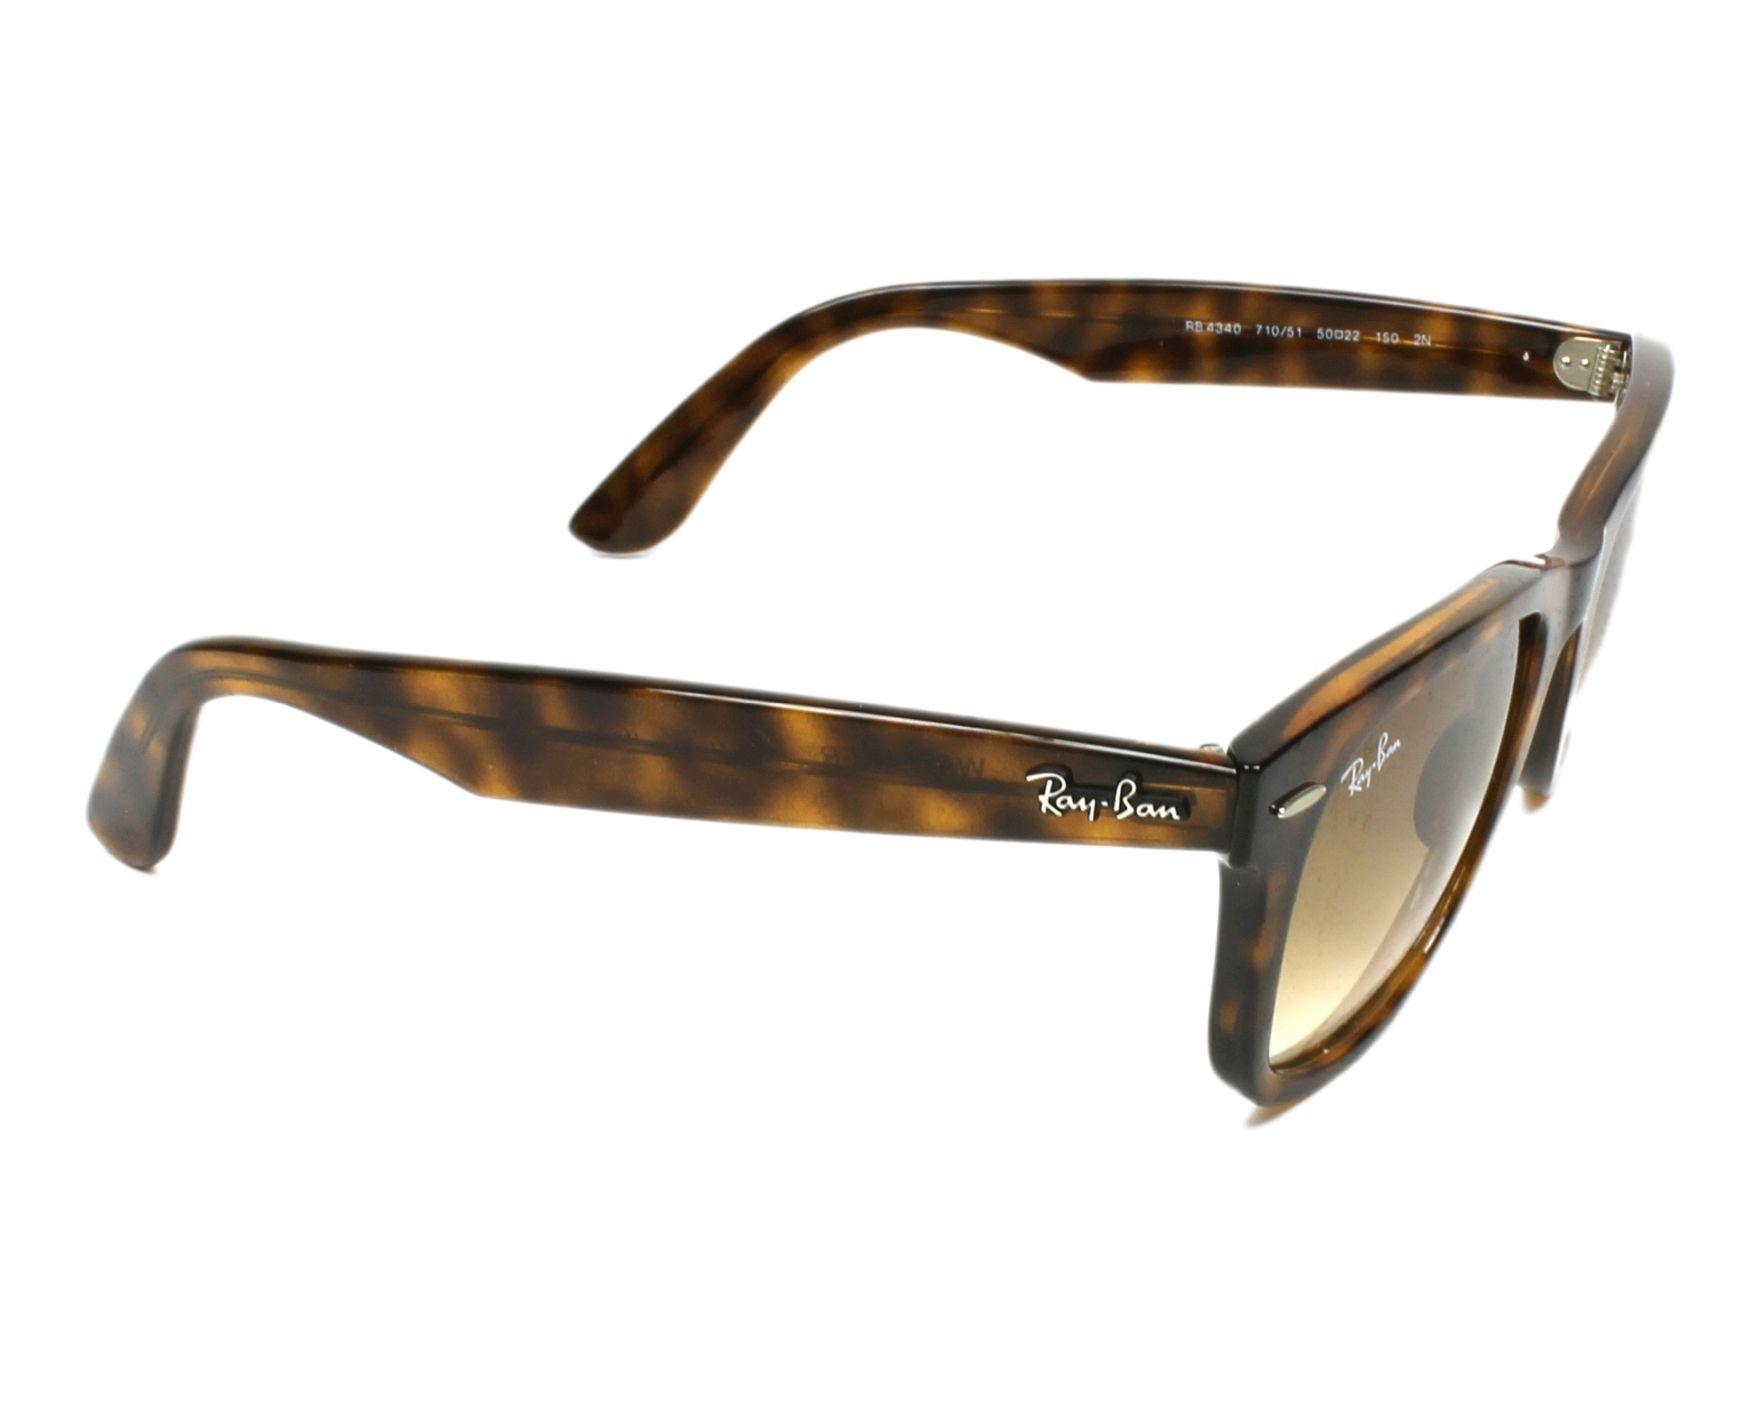 fc0446f518 Sunglasses Ray-Ban RB-4340 710 51 50-22 Havana side view